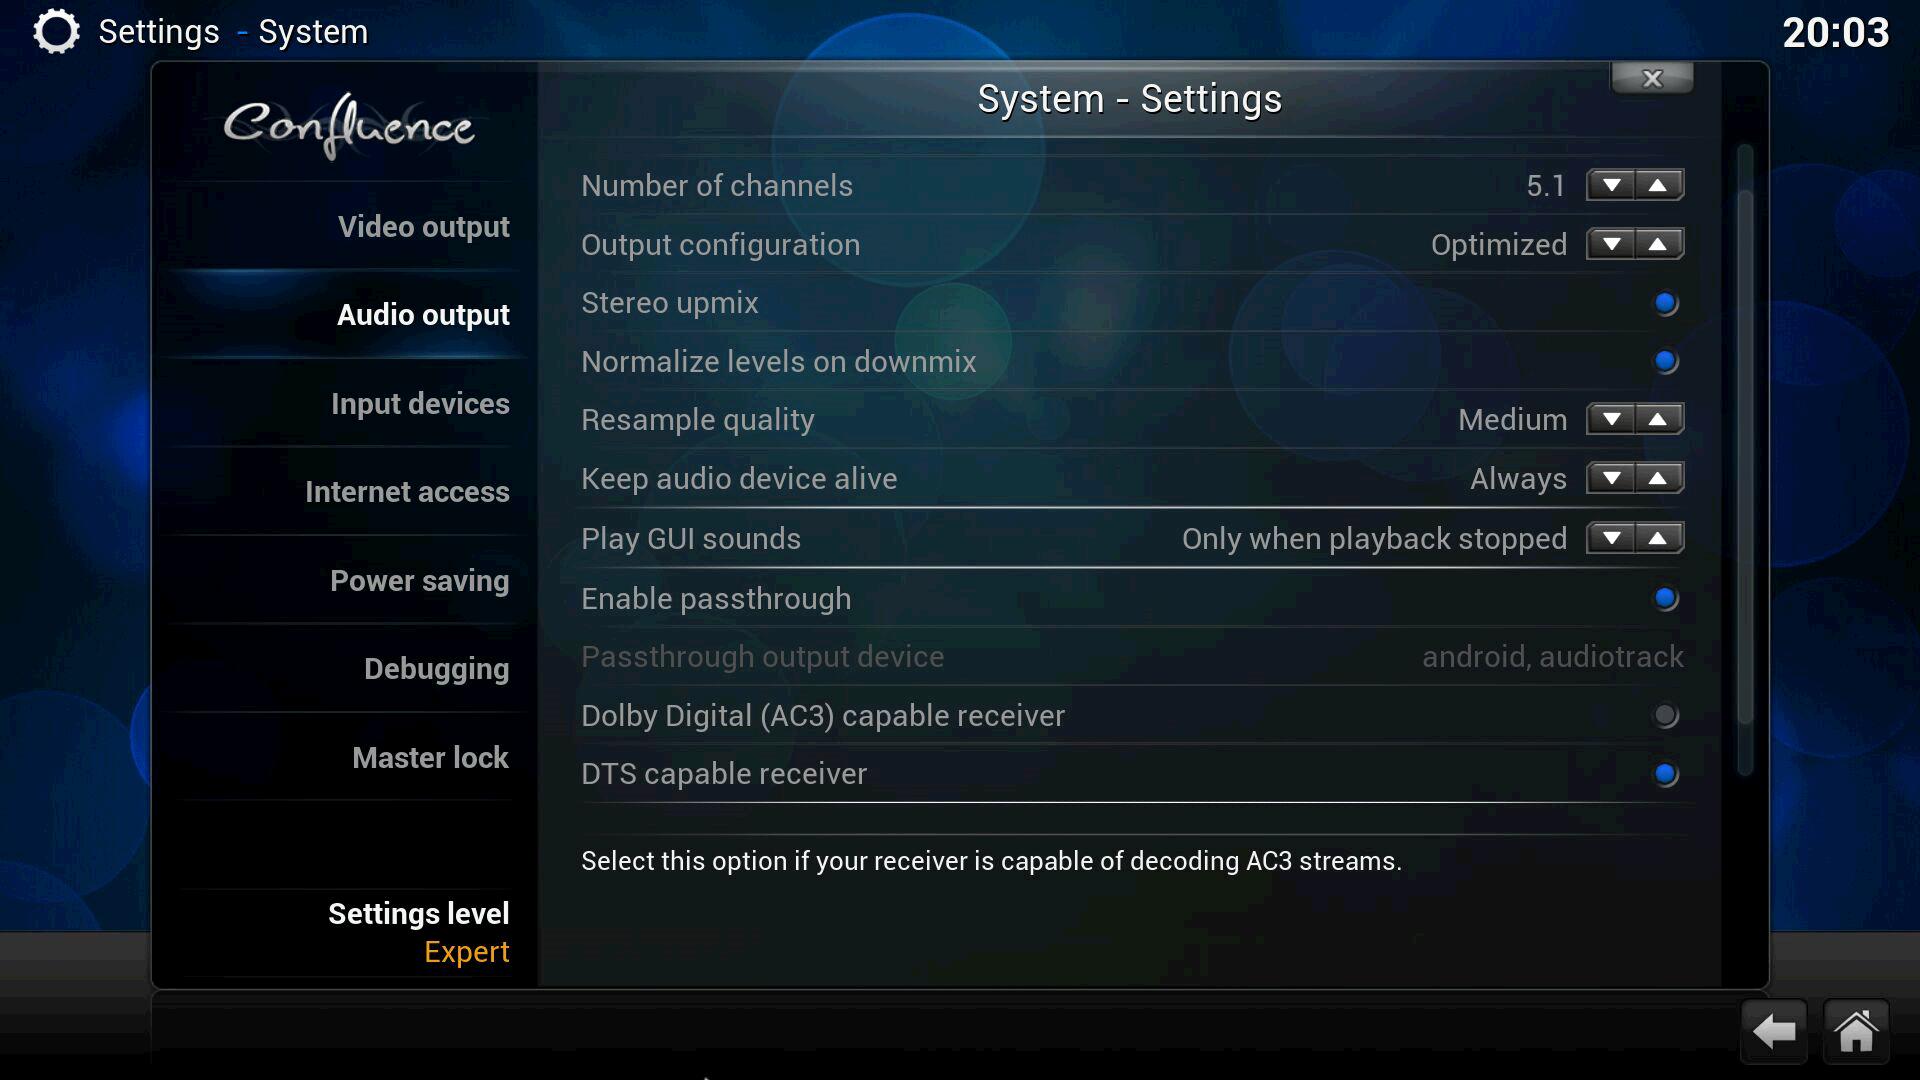 Выбор и настройка медиацентра на базе Android - 4